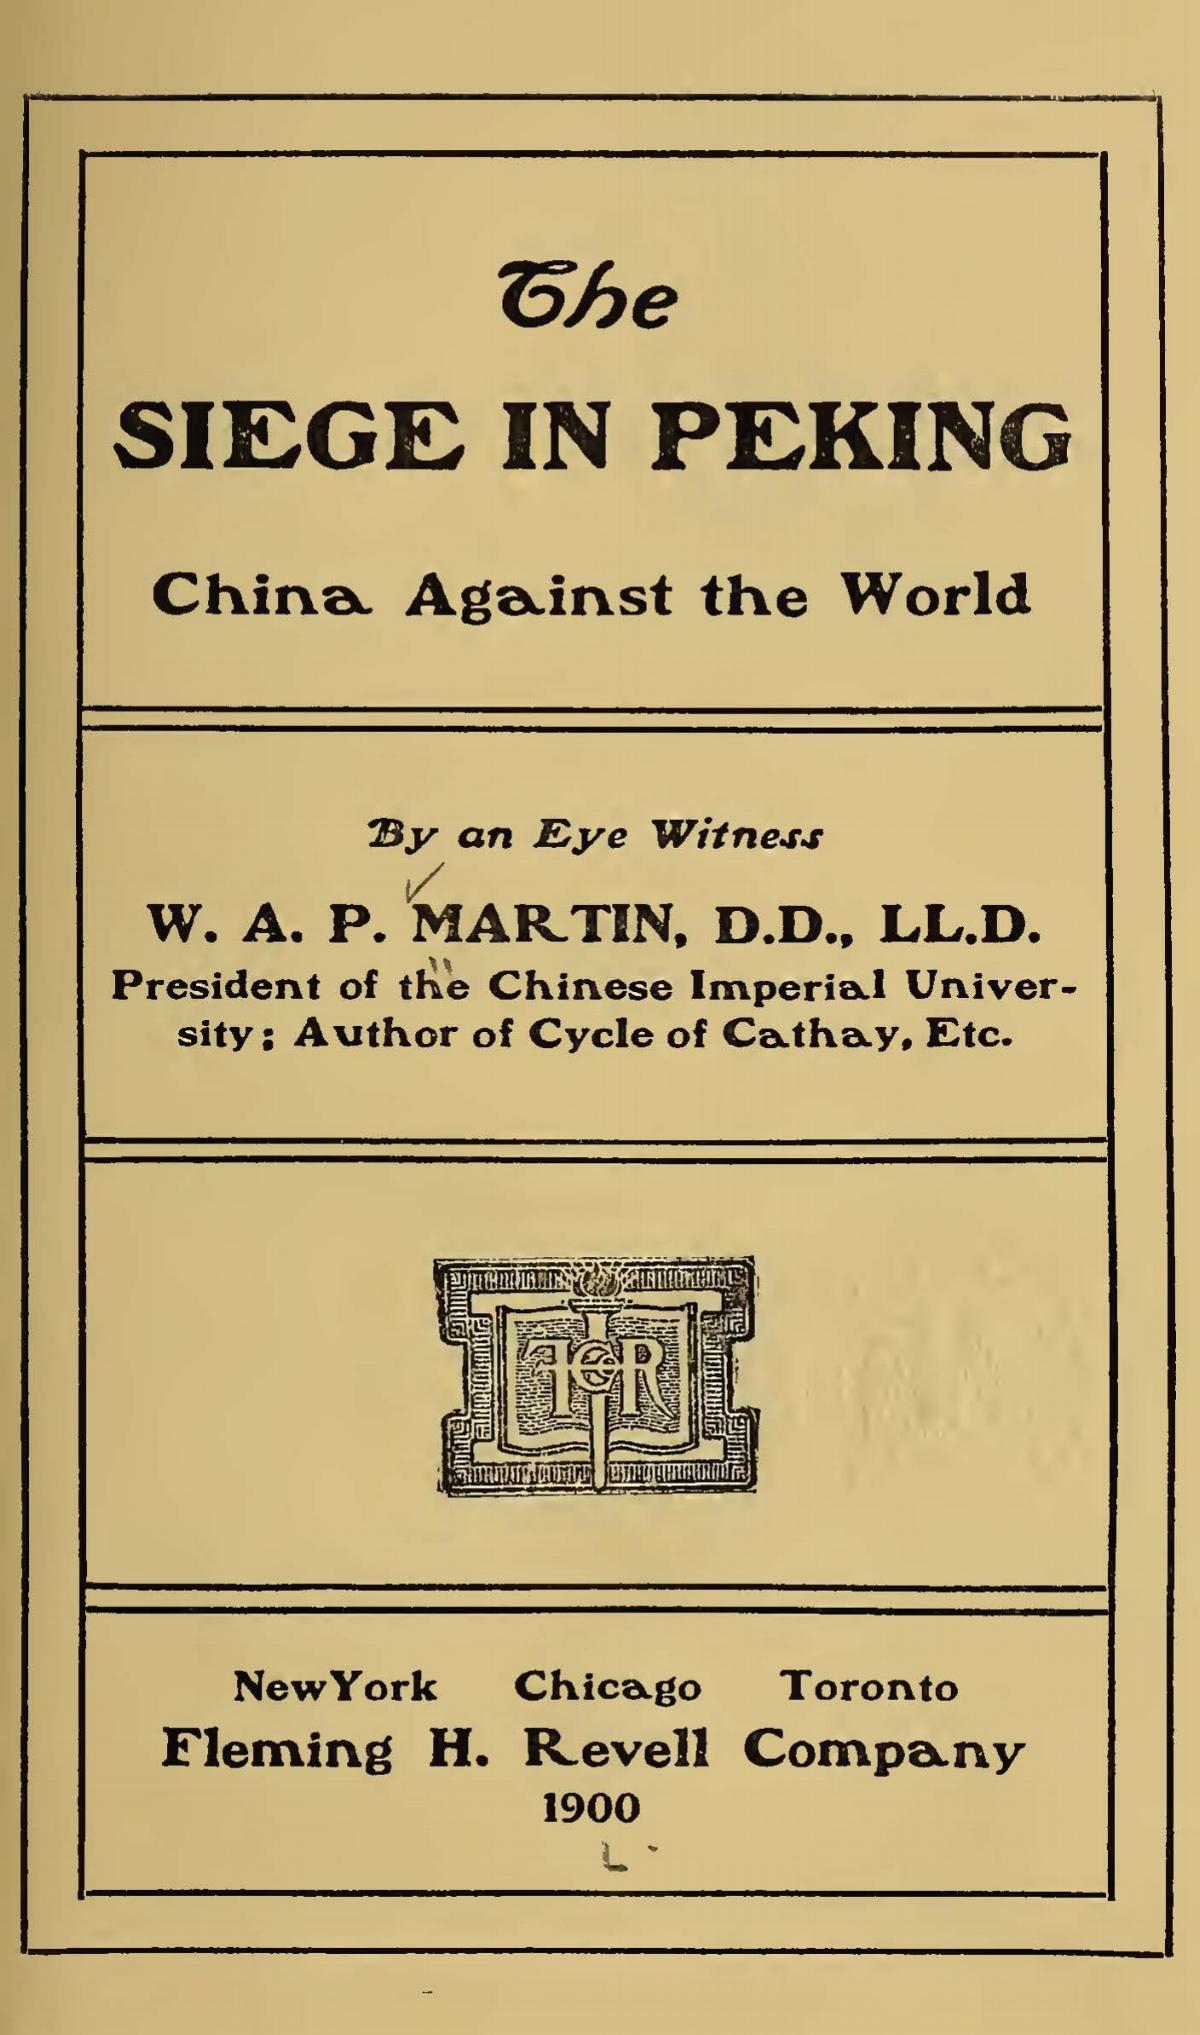 Martin, William Alexander Parsons, The Siege in Peking Title Page.jpg